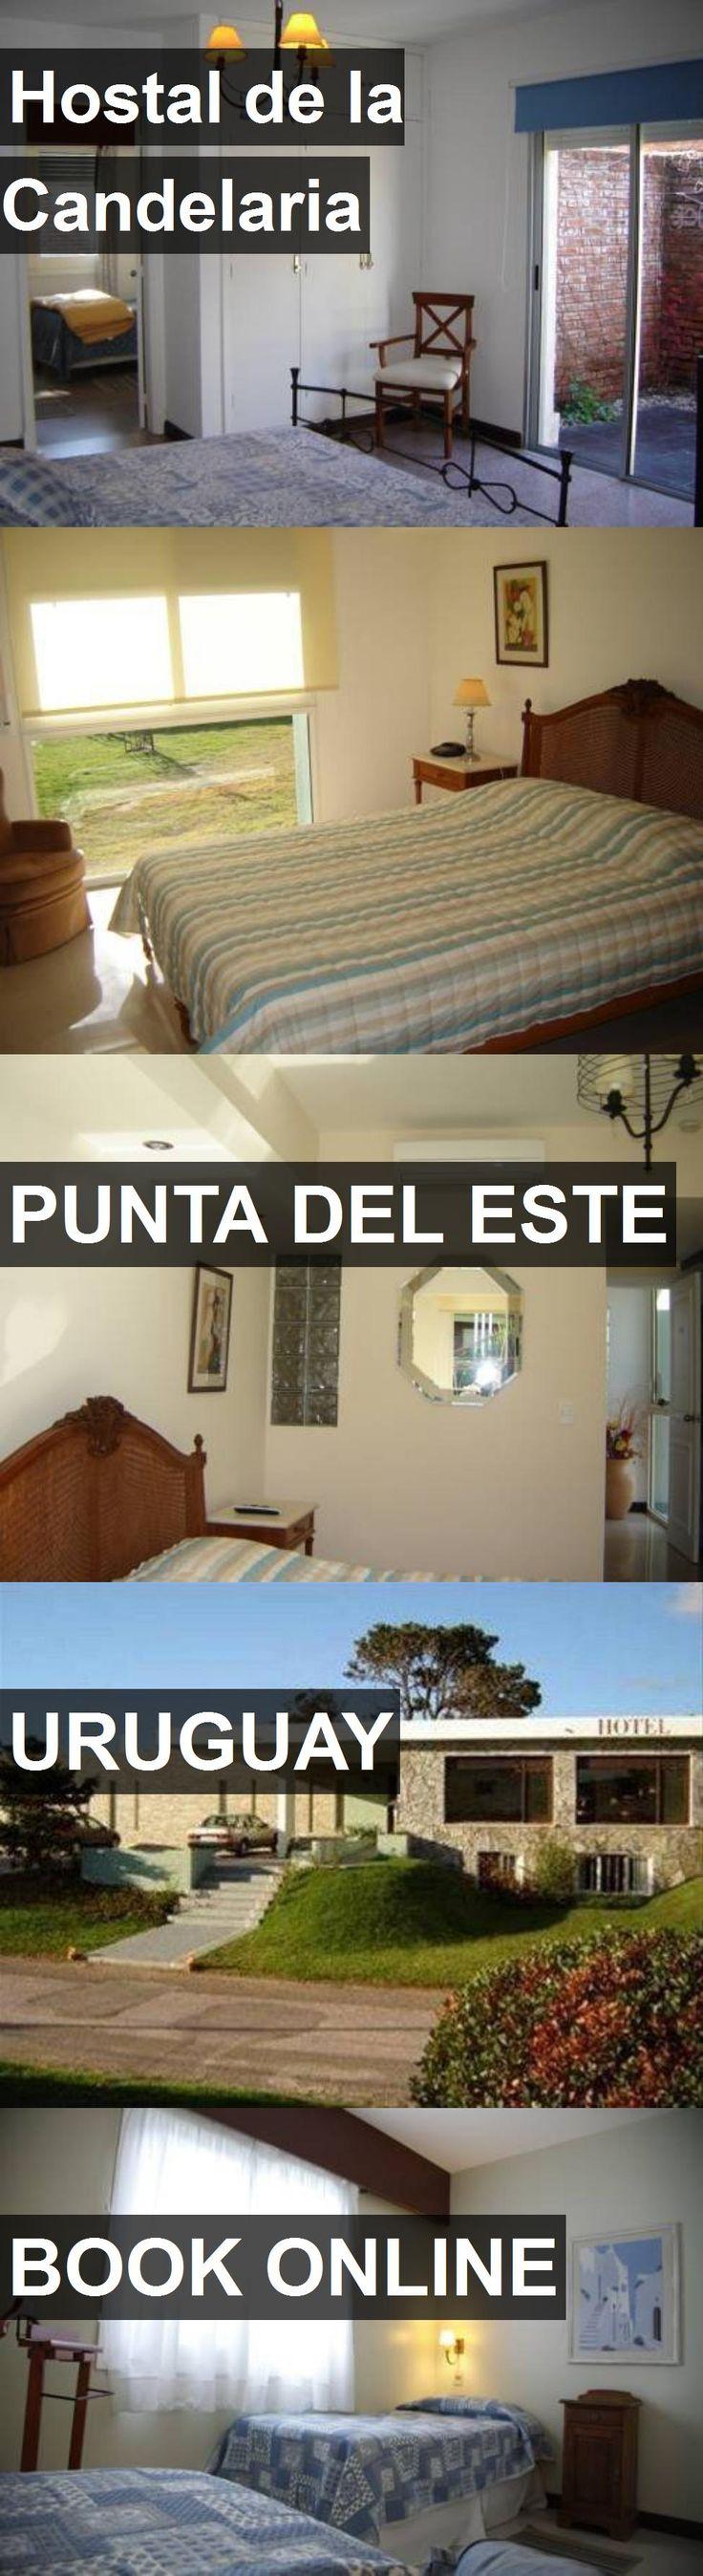 Hotel Hostal de la Candelaria in Punta del Este, Uruguay. For more information, photos, reviews and best prices please follow the link. #Uruguay #PuntadelEste #hotel #travel #vacation